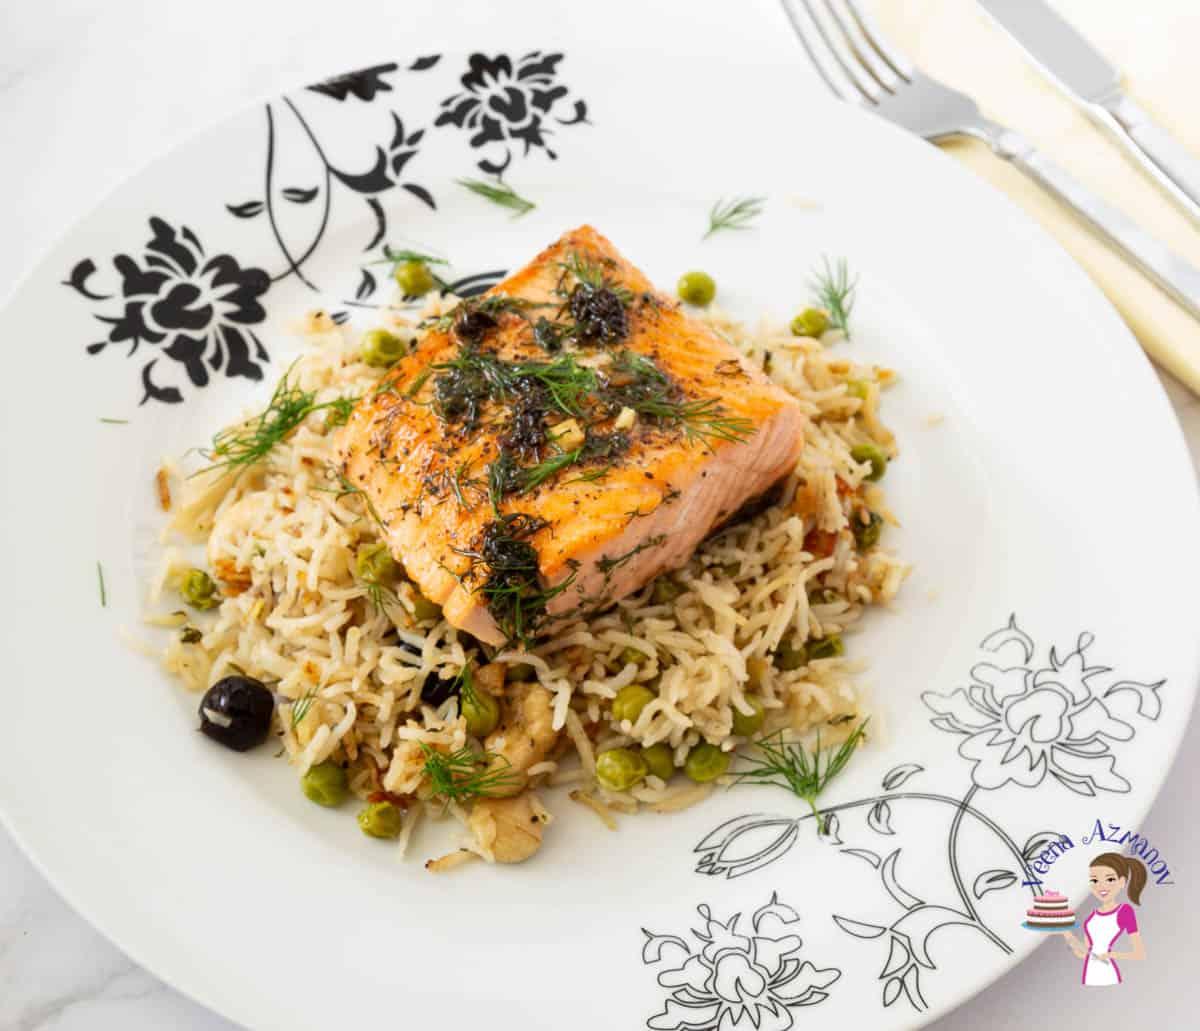 Pan fried Salmon on sauteed rice